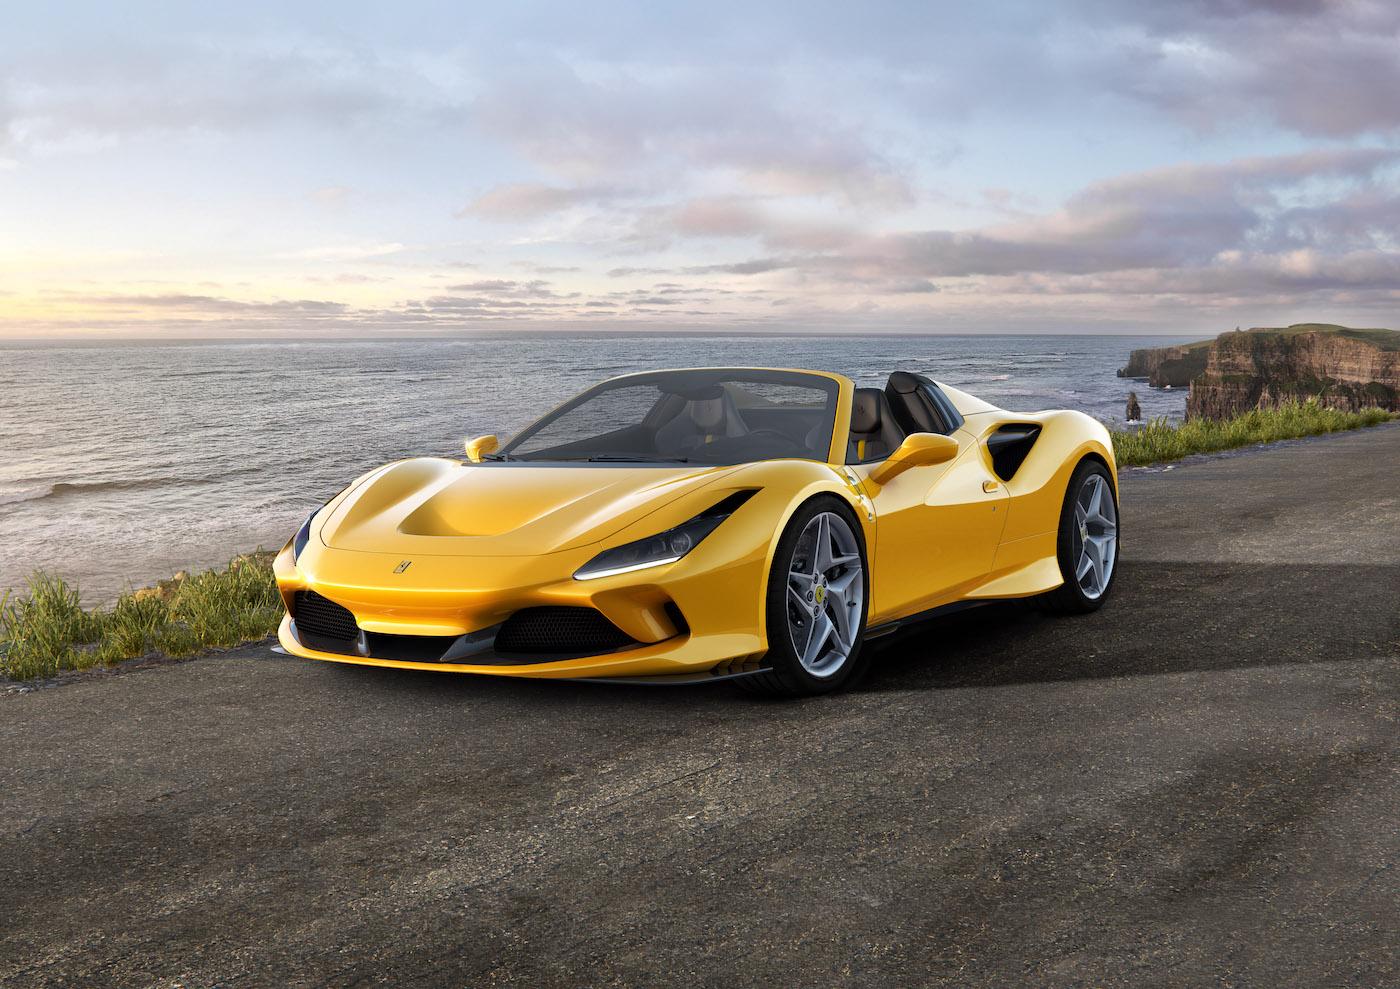 Der Neue Ferrari F8 Spider Mit Dem 720 Ps V8 Mittelmotor Proudmag Com